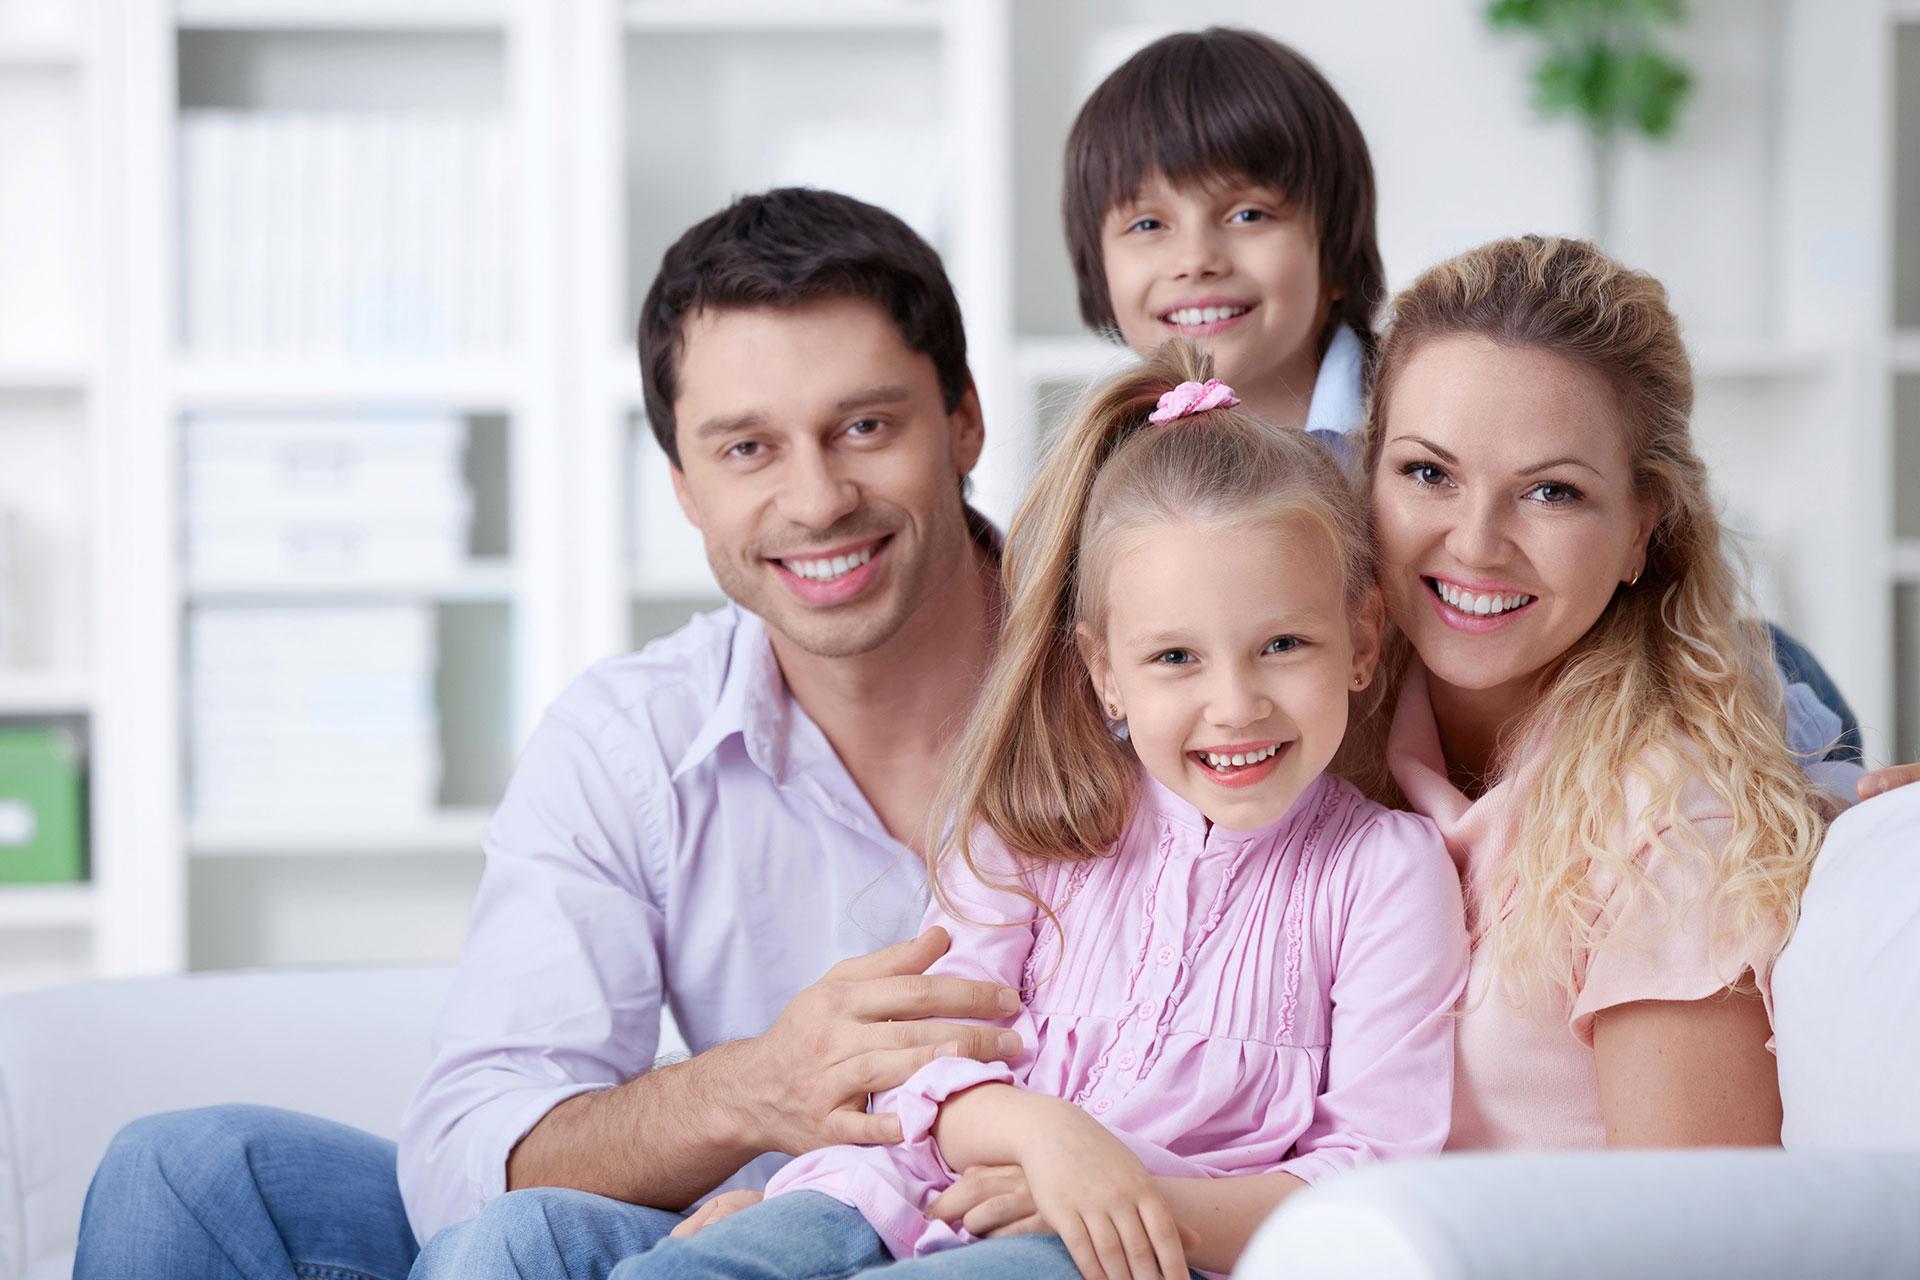 northwest houston family dental patients